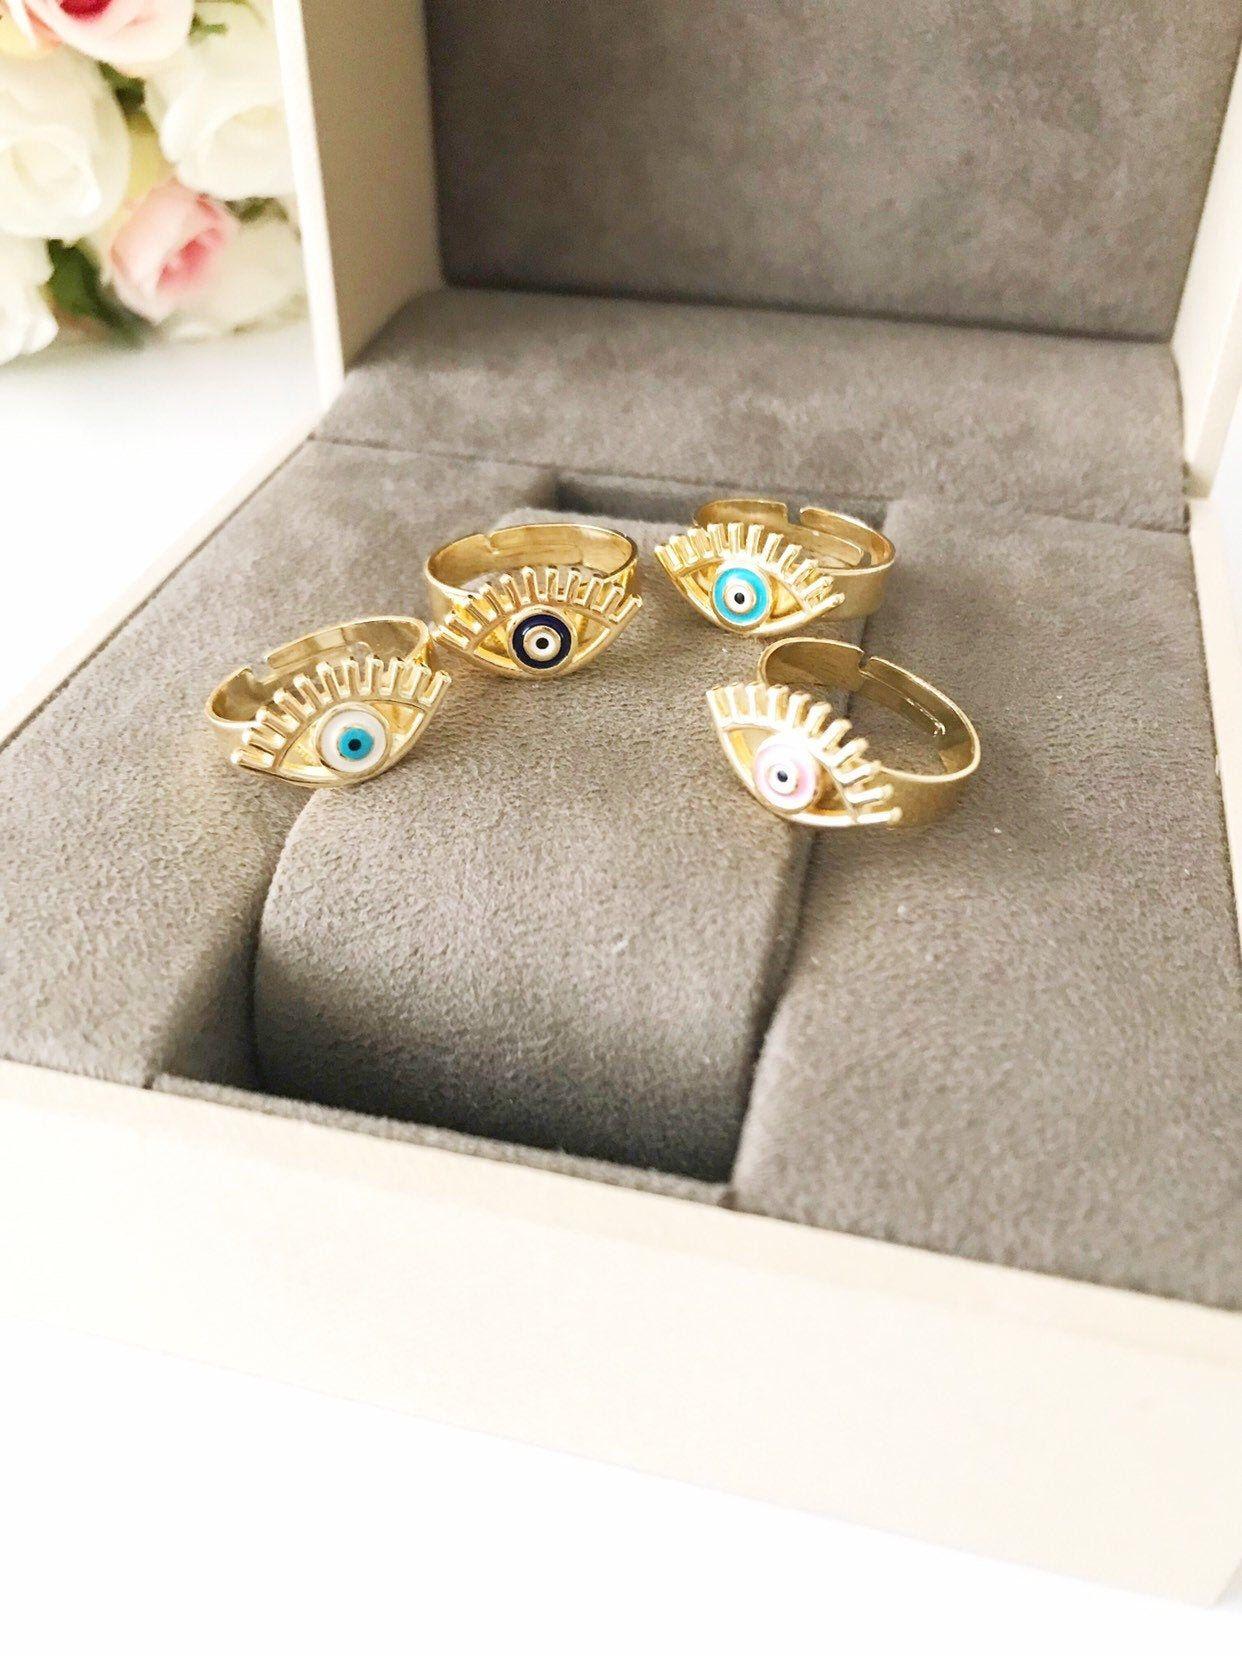 Photo of Blue evil eye ring, adjustable ring, dainty ring, evil eye gold jewelry, evil eye jewelry, blue evil eye bead, joint rings, greek jewelry